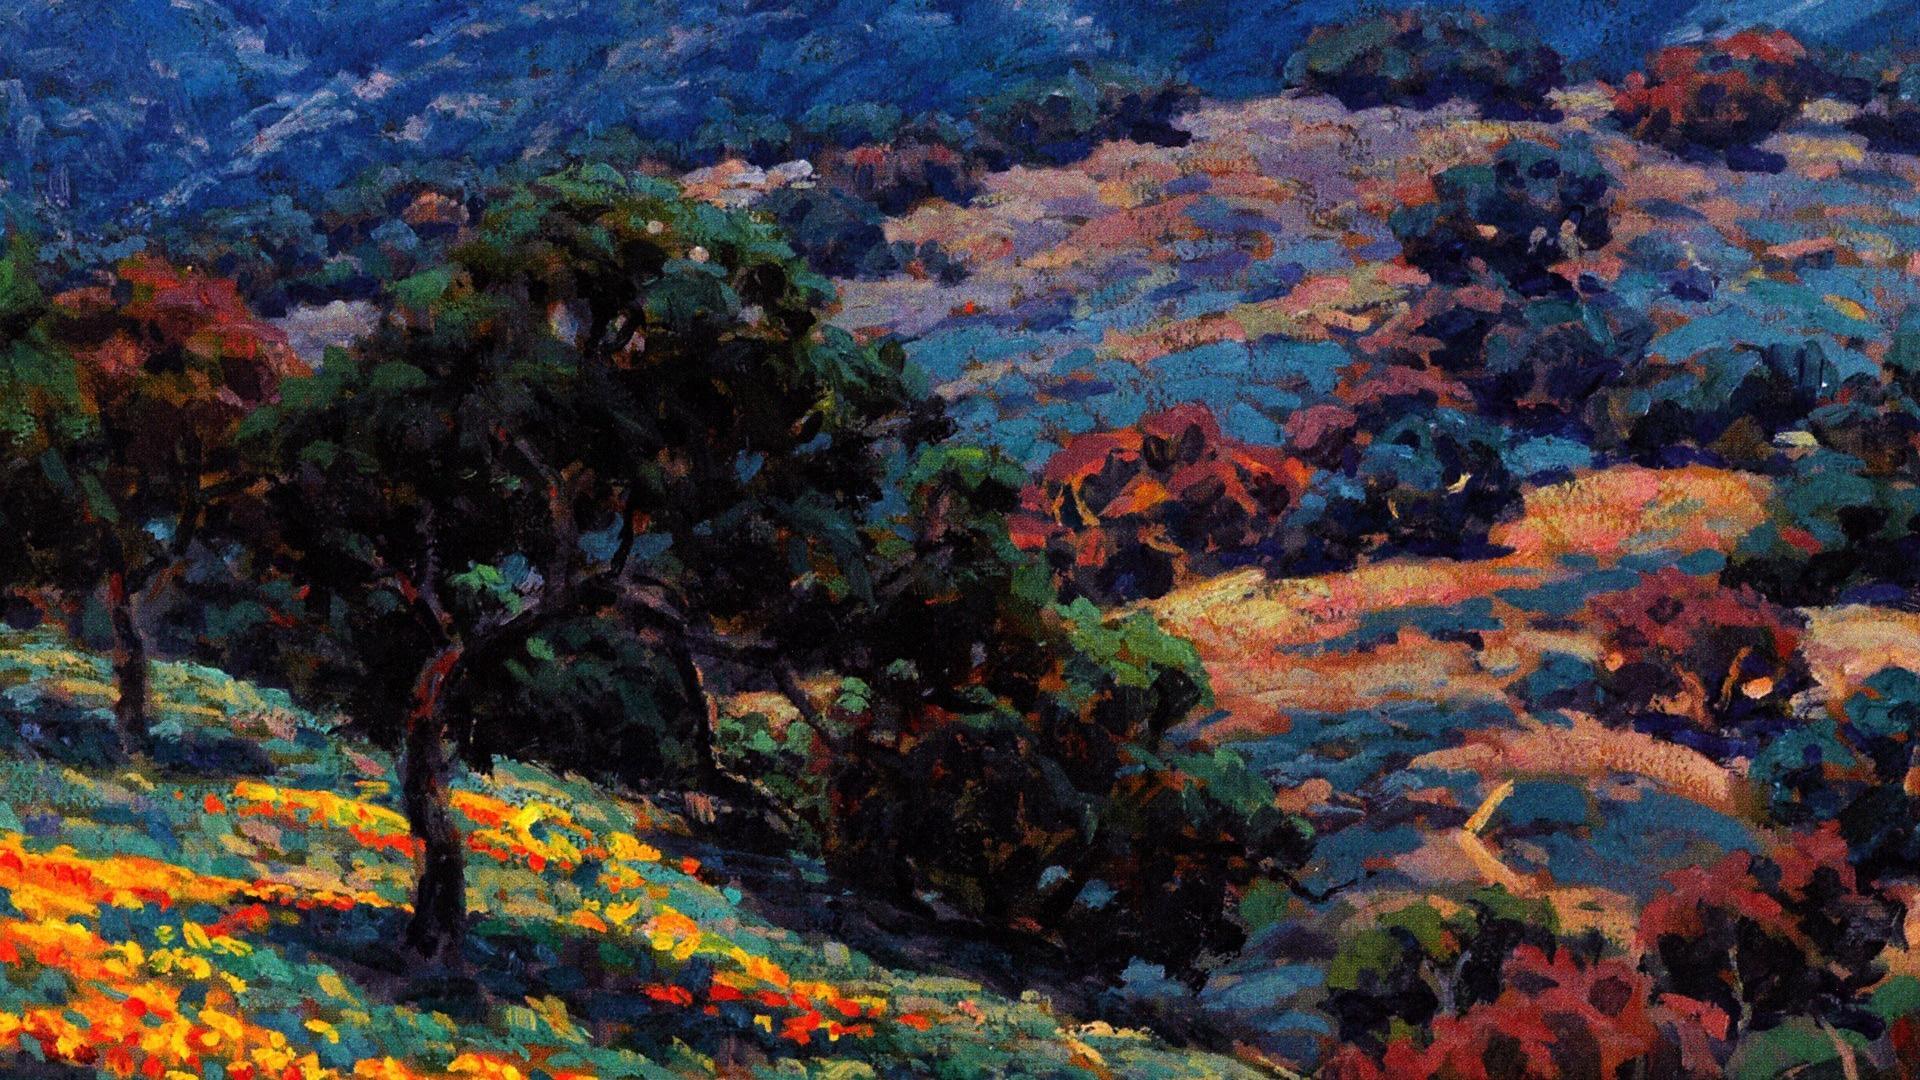 Impressionist painting wallpaper 87961 1920x1080